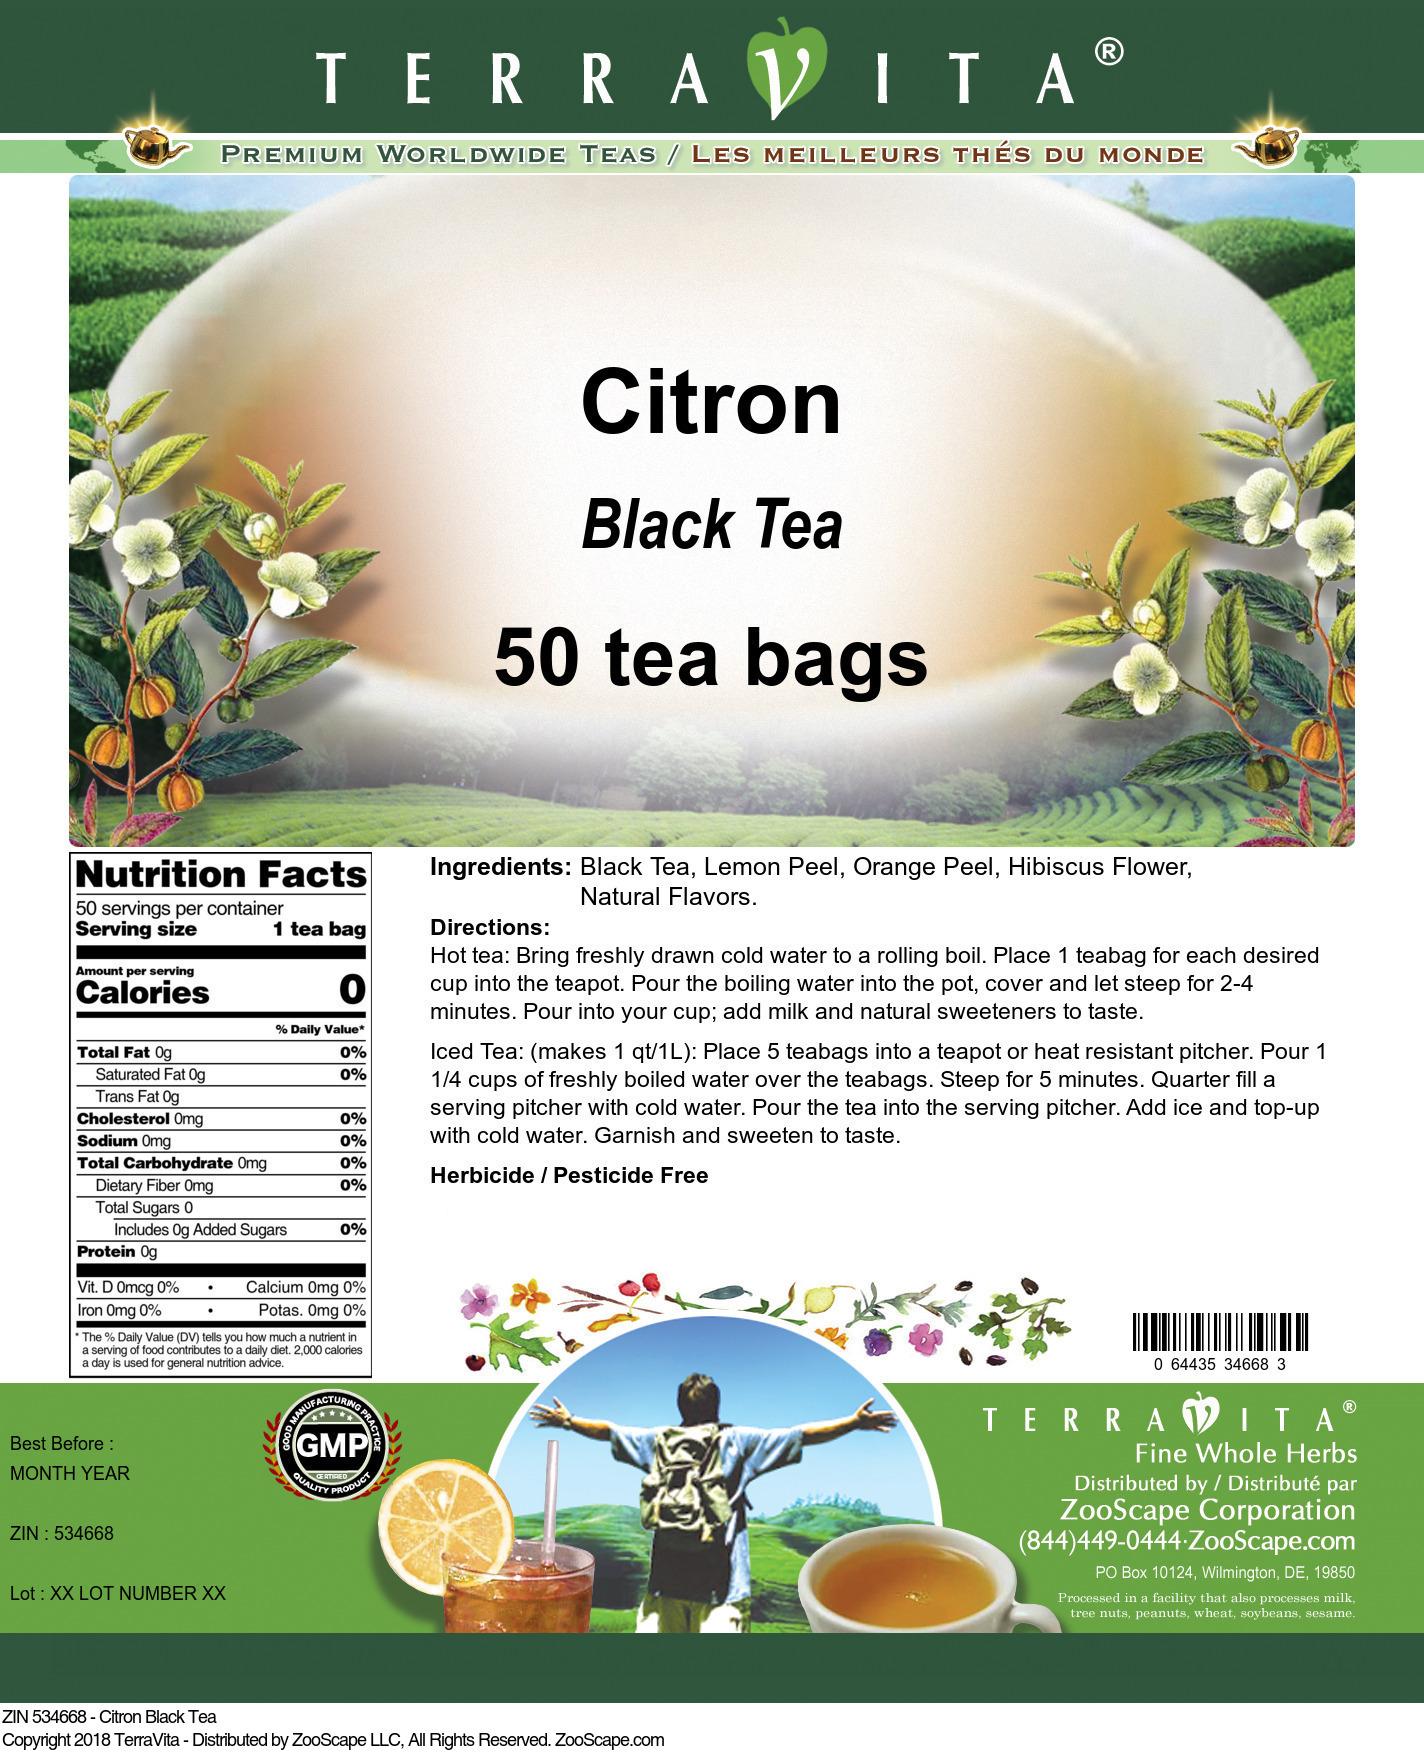 Citron Black Tea